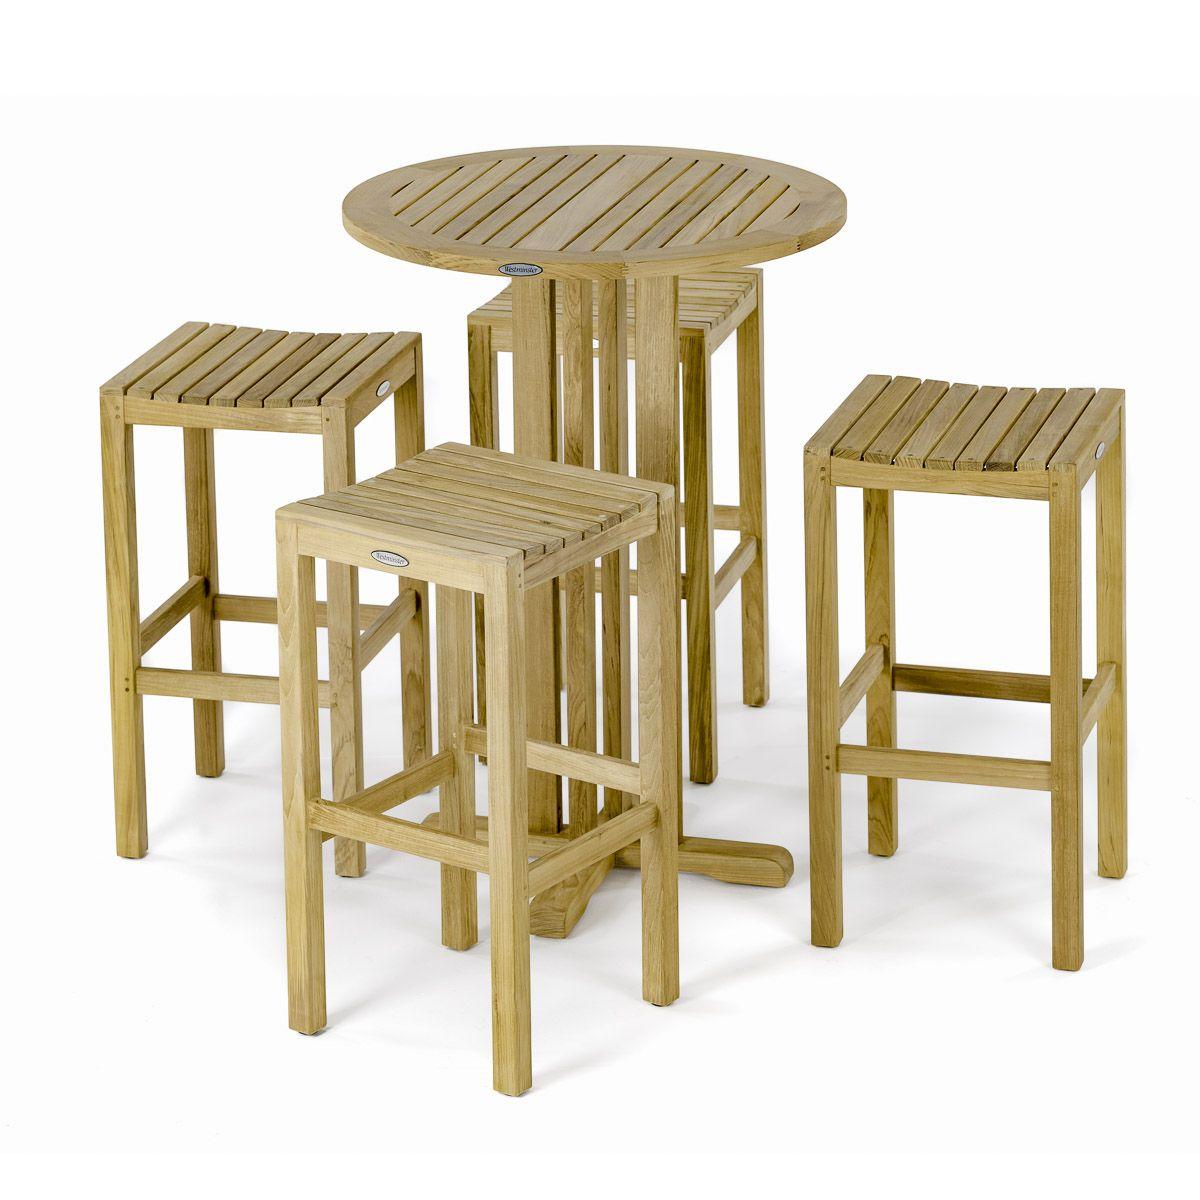 Groovy Round Backless Teak Barstool Set In 2019 Teak Cocktail Creativecarmelina Interior Chair Design Creativecarmelinacom